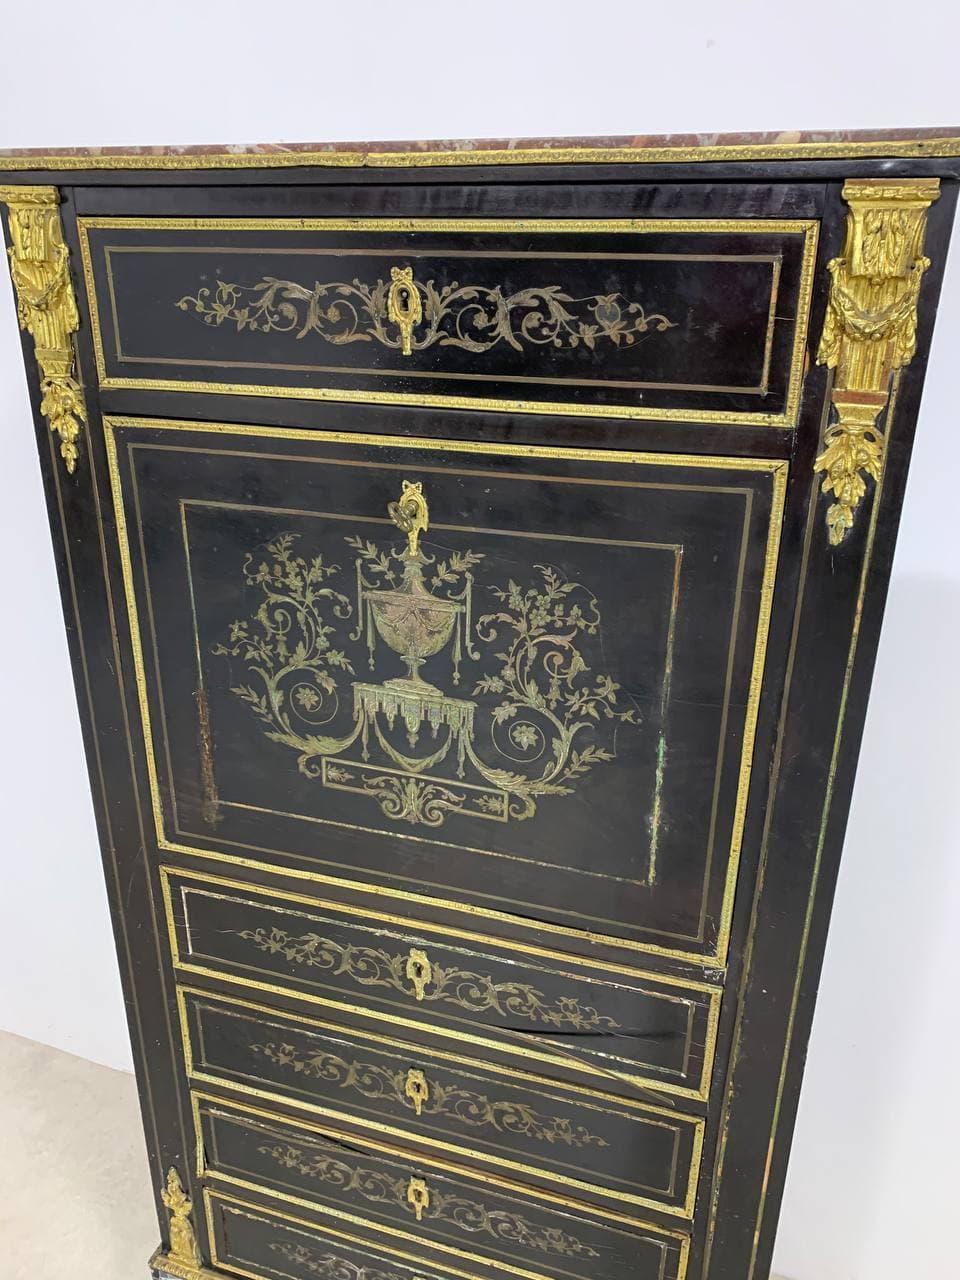 Антикварный секретер эпохи Наполеона III